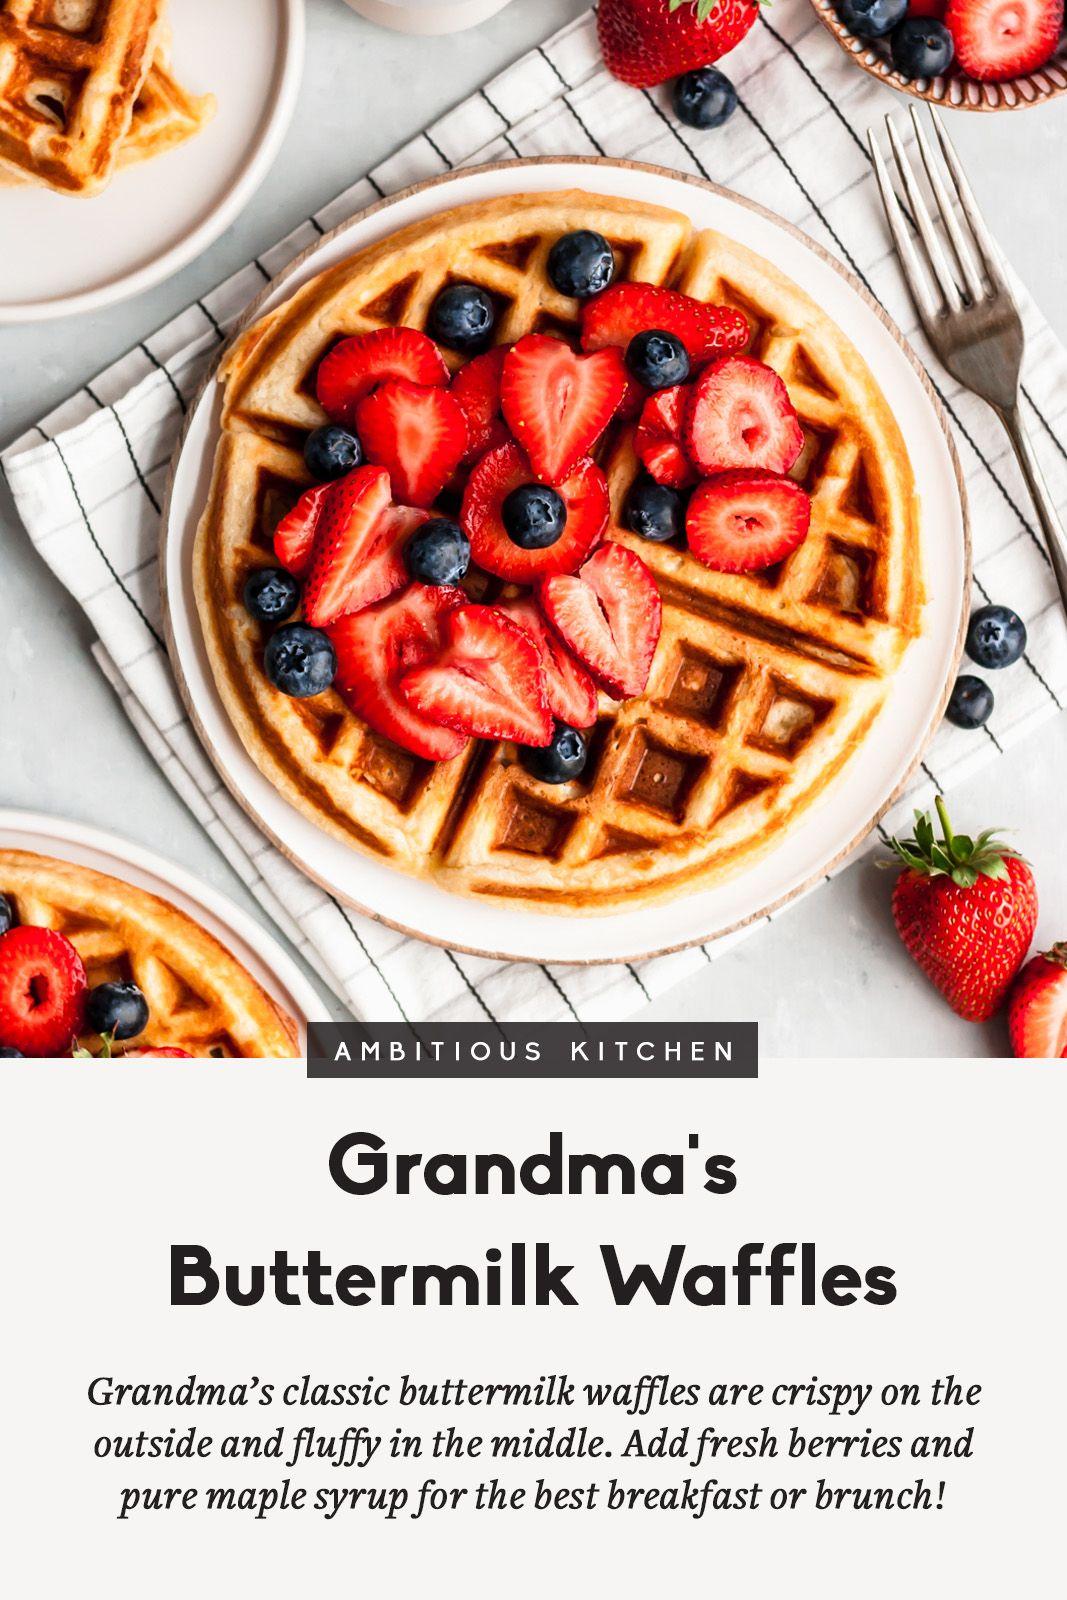 Grandma S Buttermilk Waffles Recipe Buttermilk Waffles Homemade Waffles Breakfast